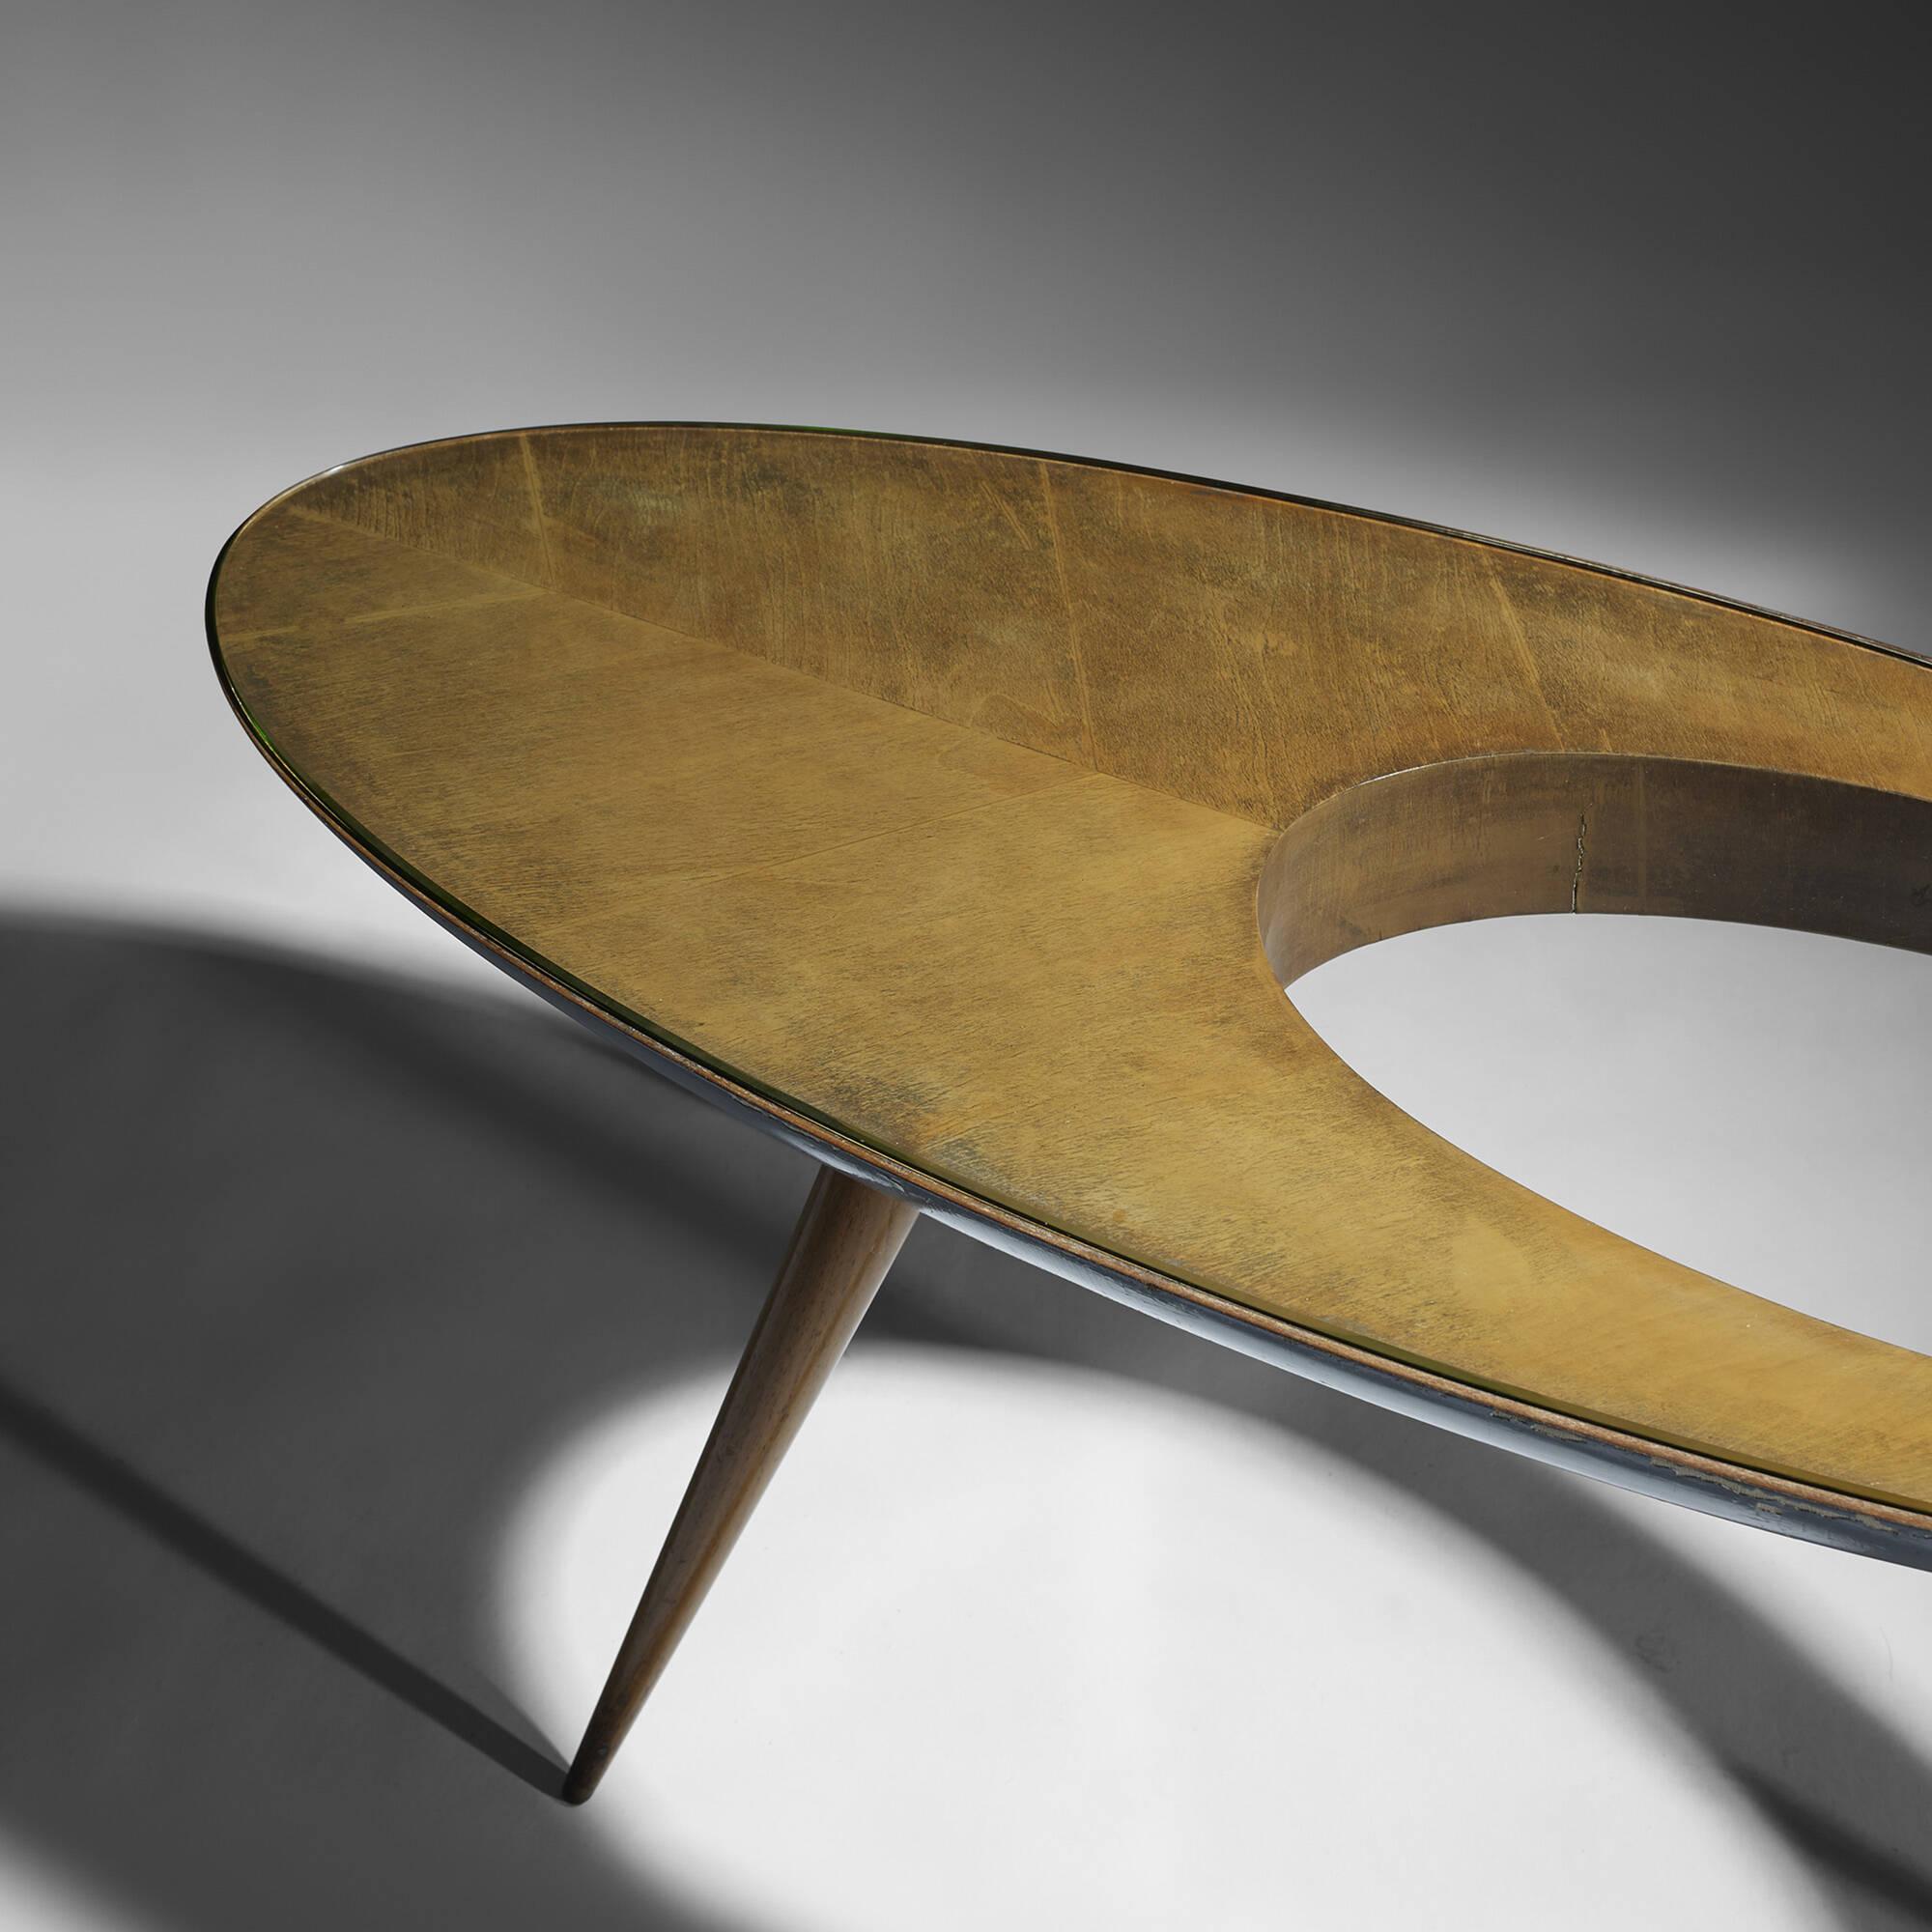 210 Gio Ponti Rare and Important coffee table Design 12 June